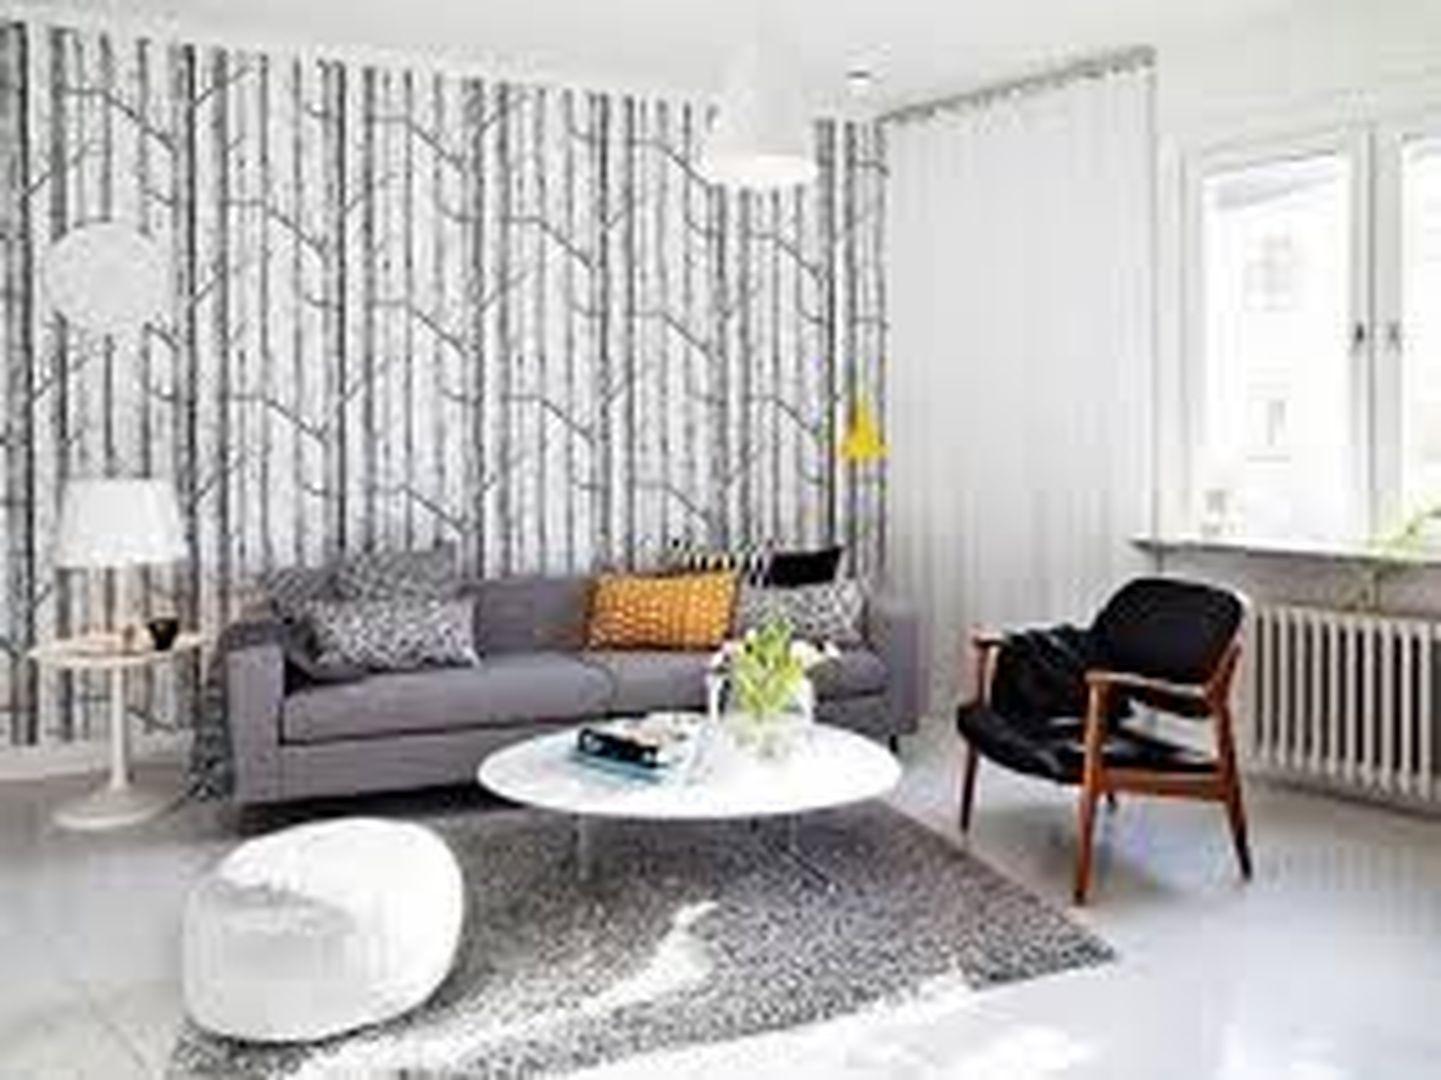 33 modern scandinavian interior design ideas http oscargrantprotests com 33